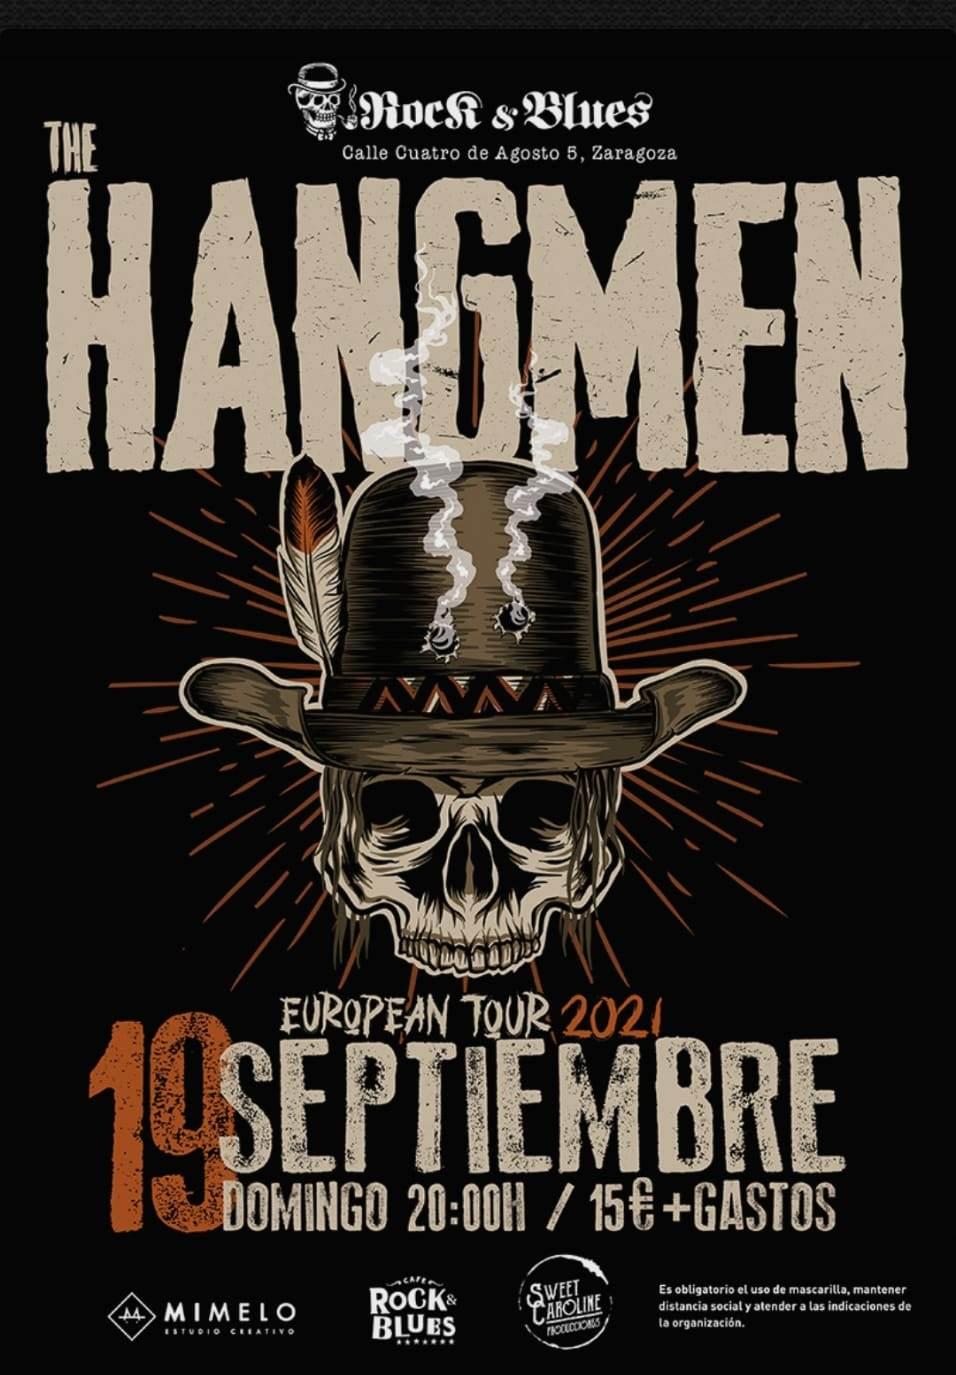 The Hangmen Rock and blues zaragoza